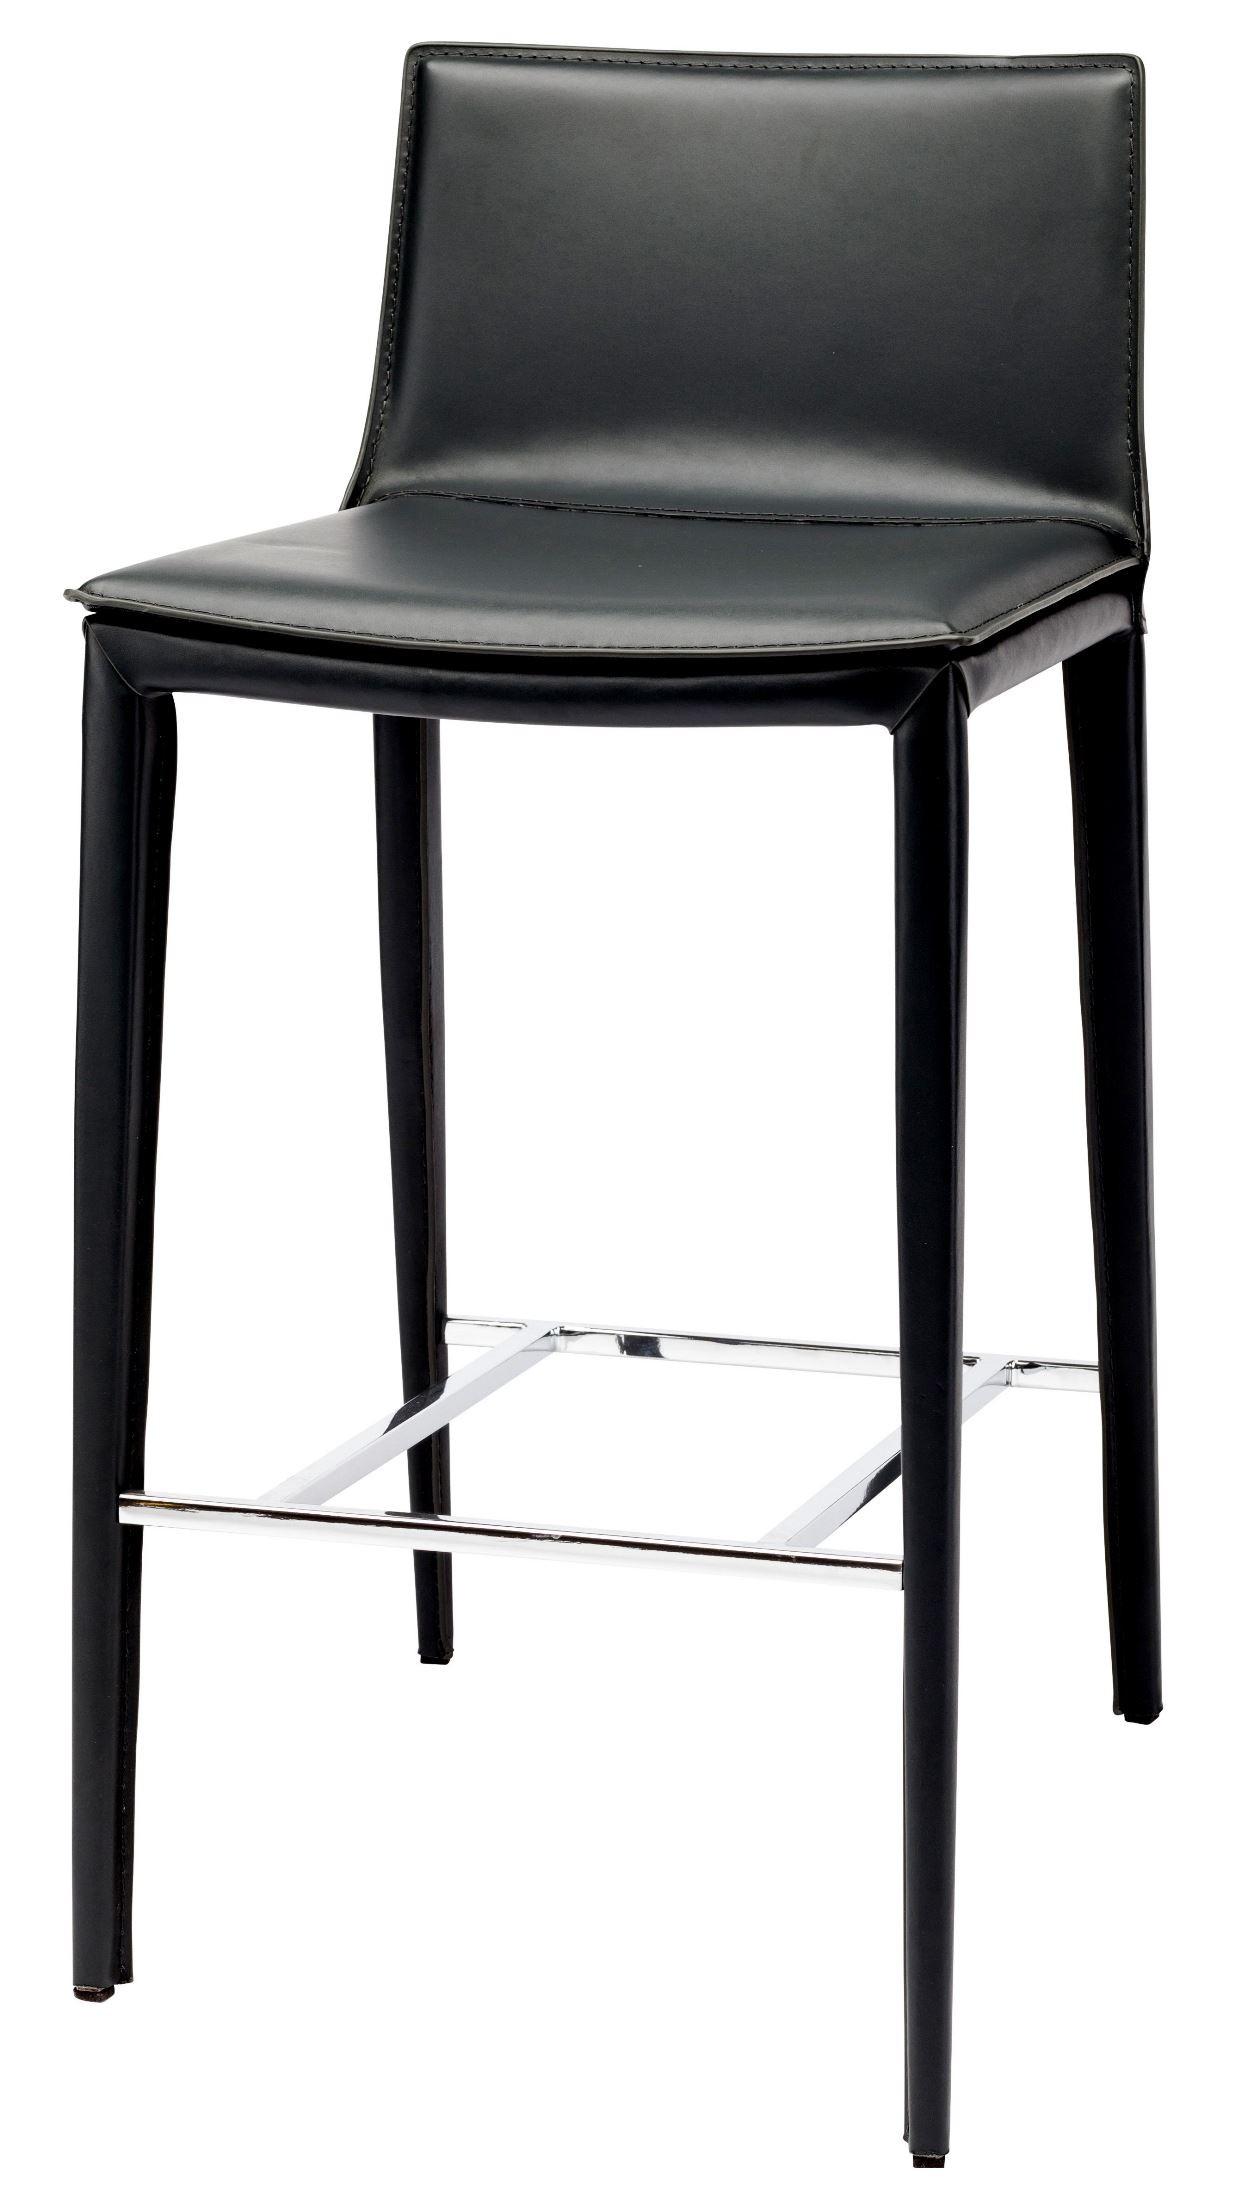 Palma Black Leather Bar Stool From Nuevo Coleman Furniture